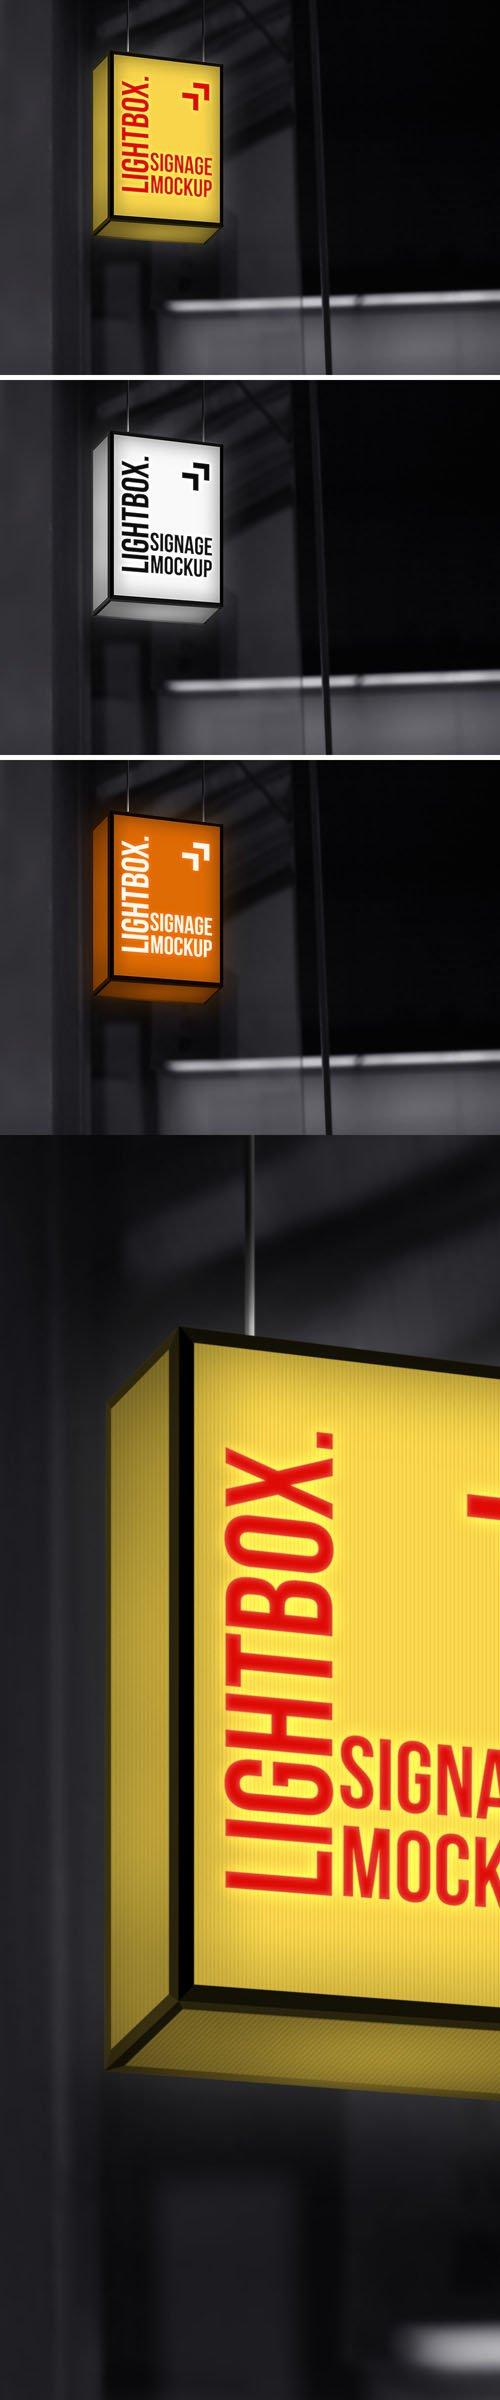 Hanging Neon Lightbox Signage PSD Mockup Template